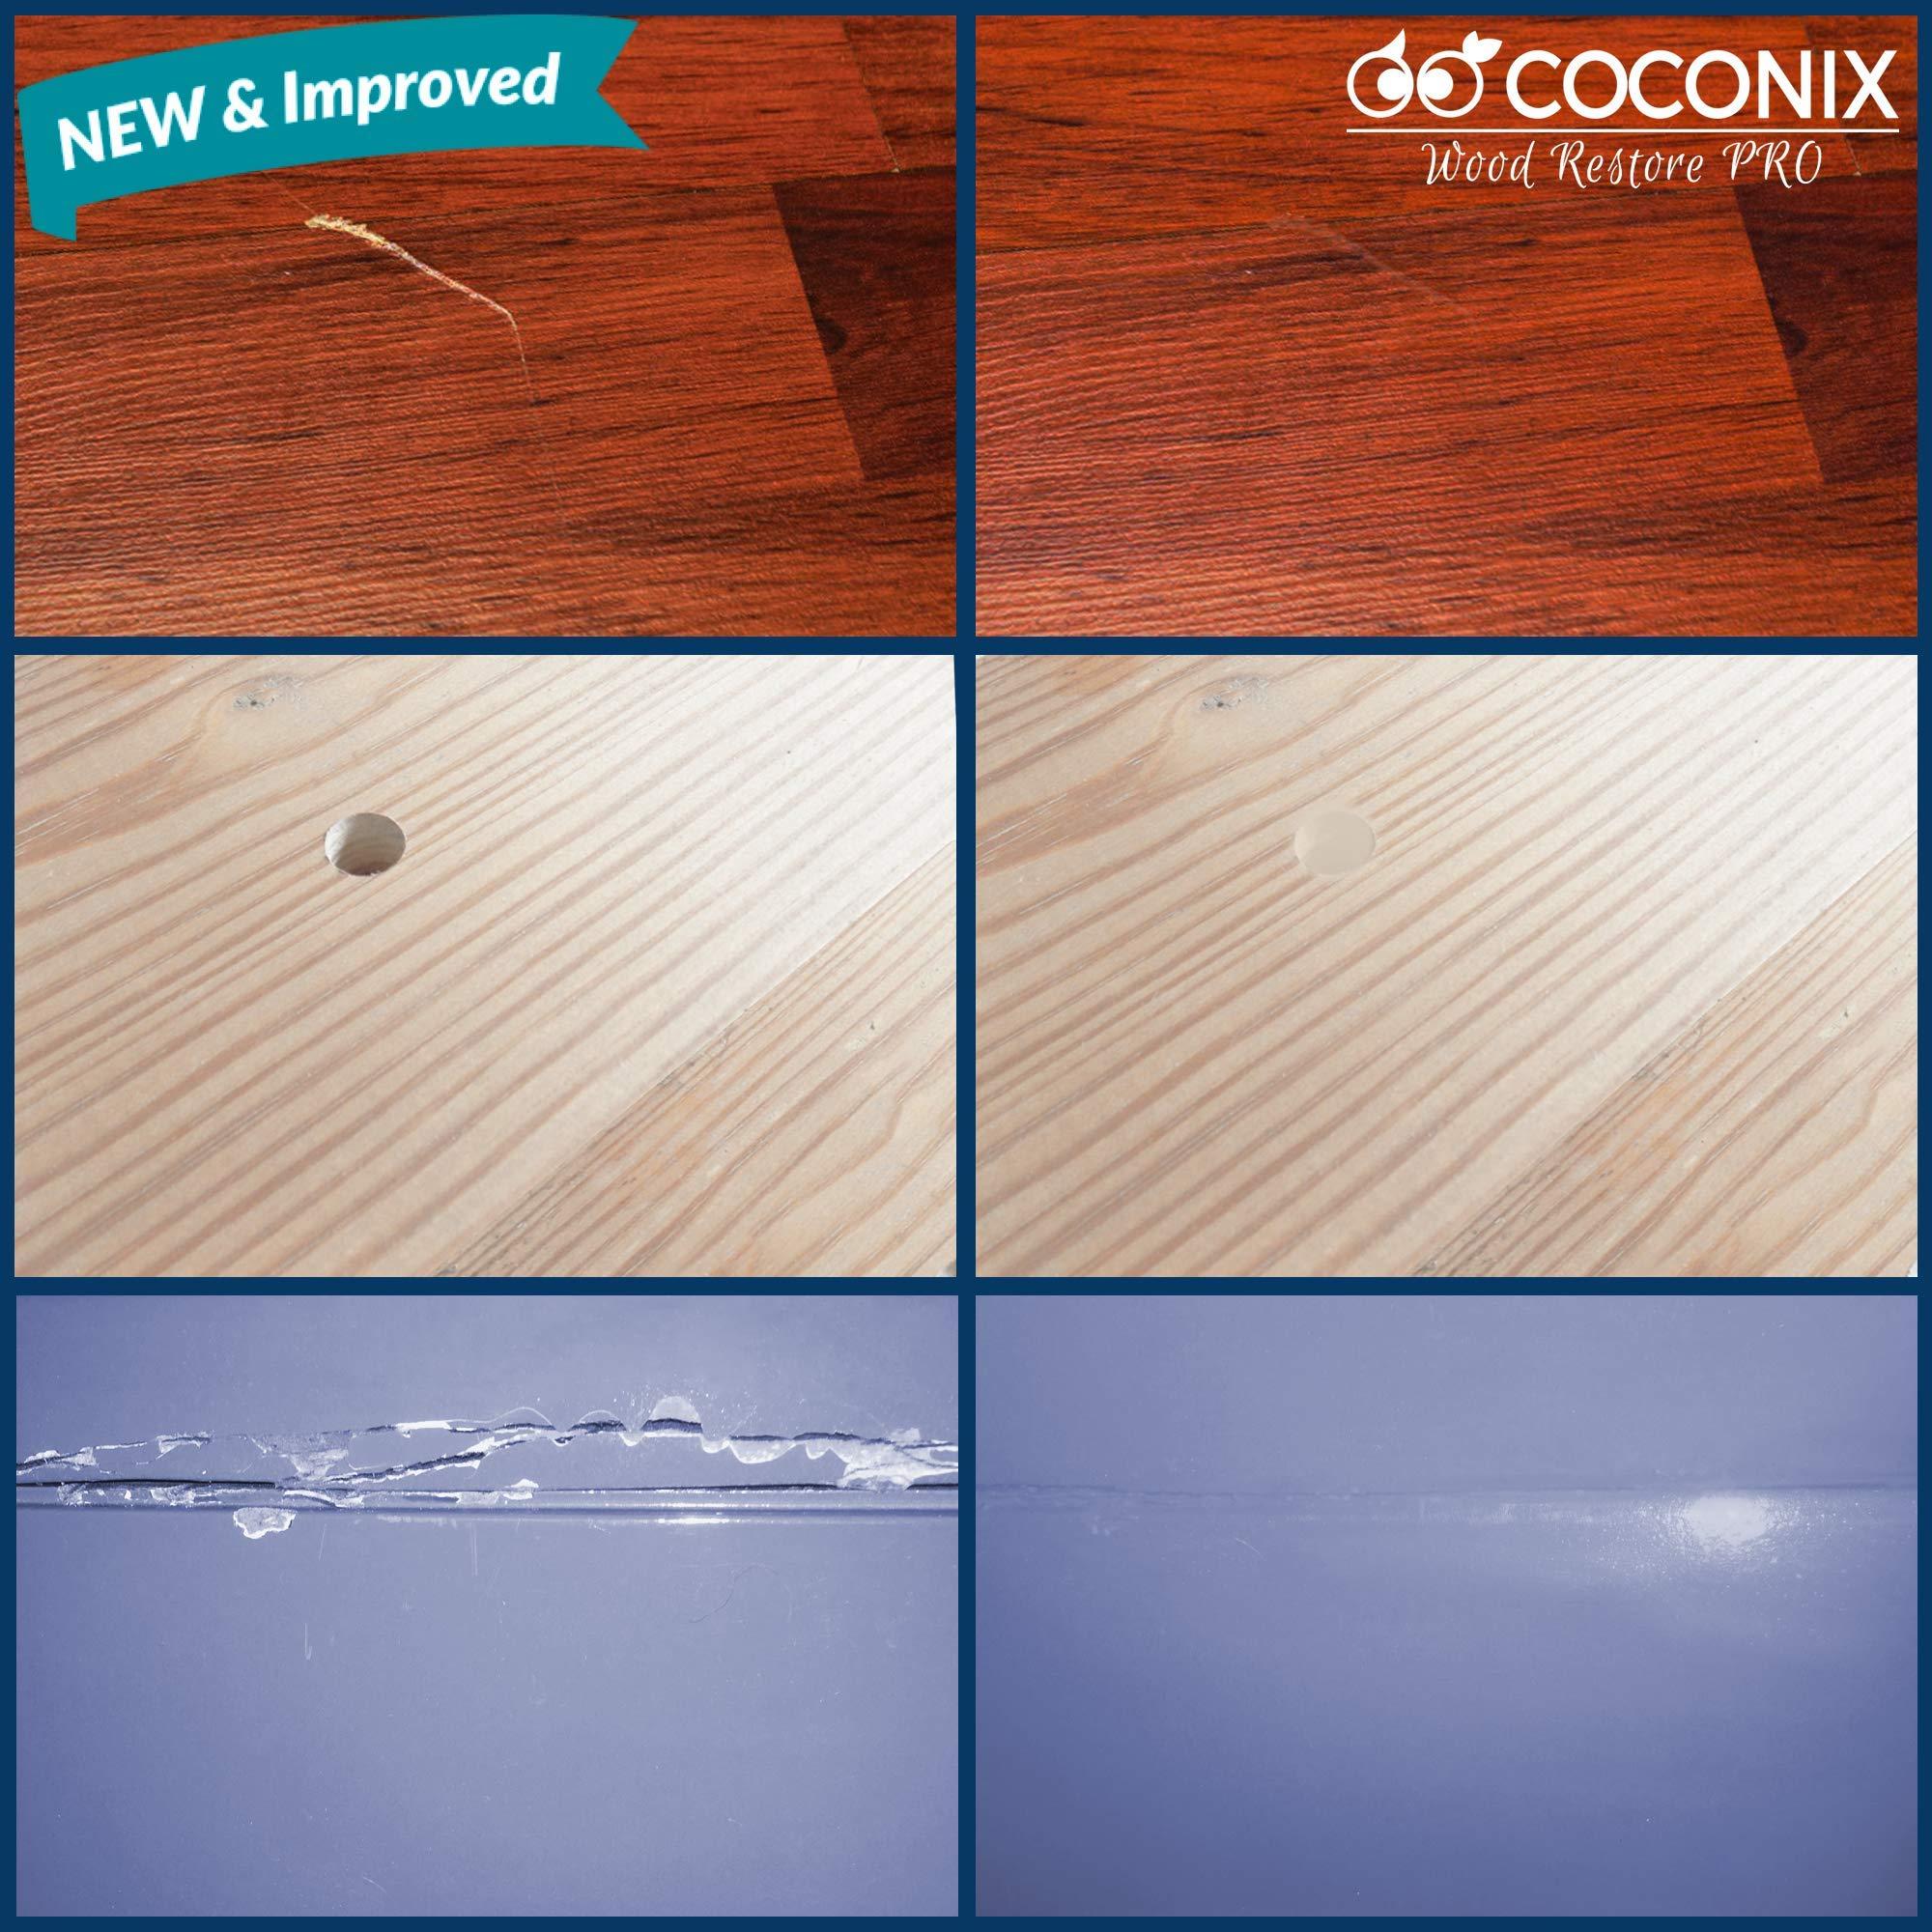 Coconix Wood Restore PRO - Professional Floor & Furniture Repair Kit by Coconix (Image #4)